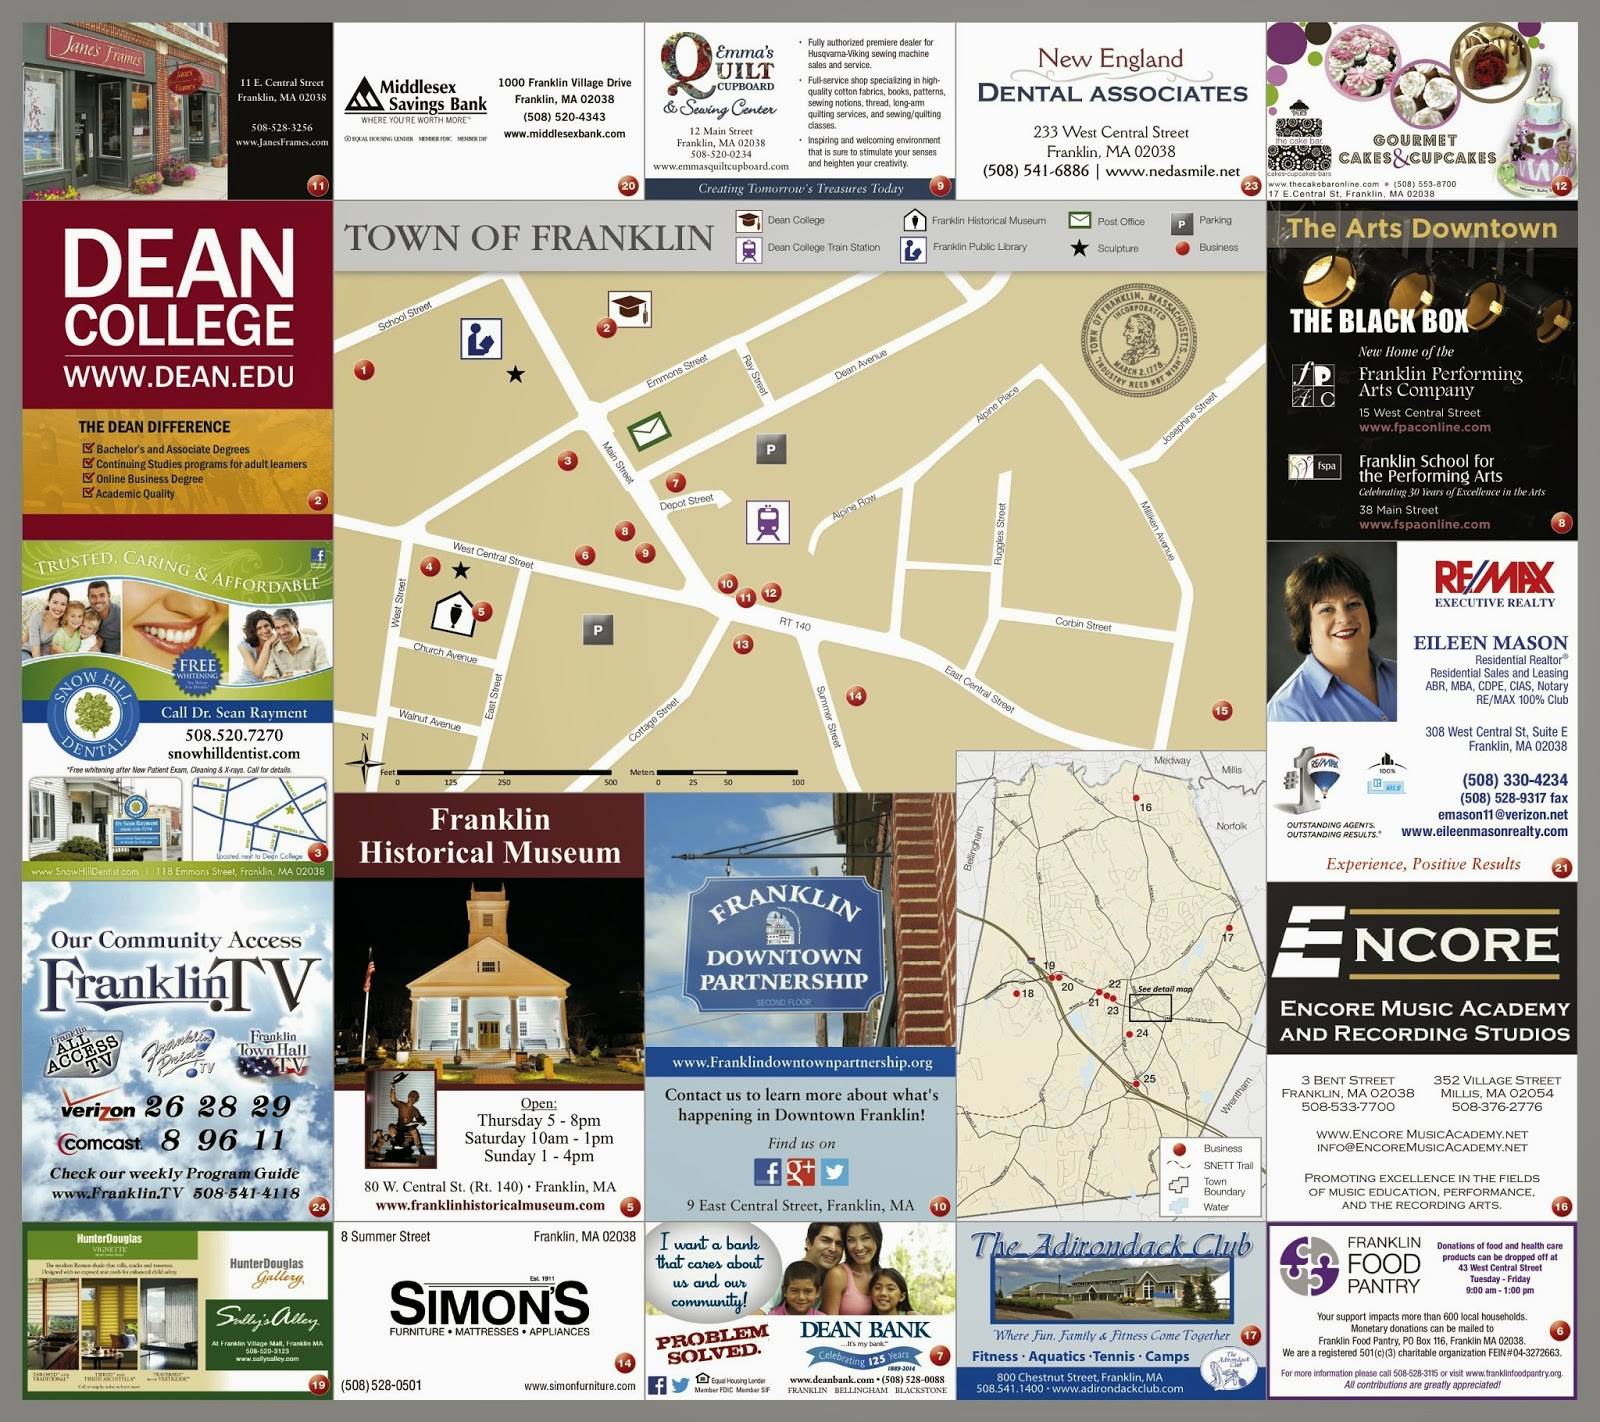 Franklin Downtown Partnership brochure - p2